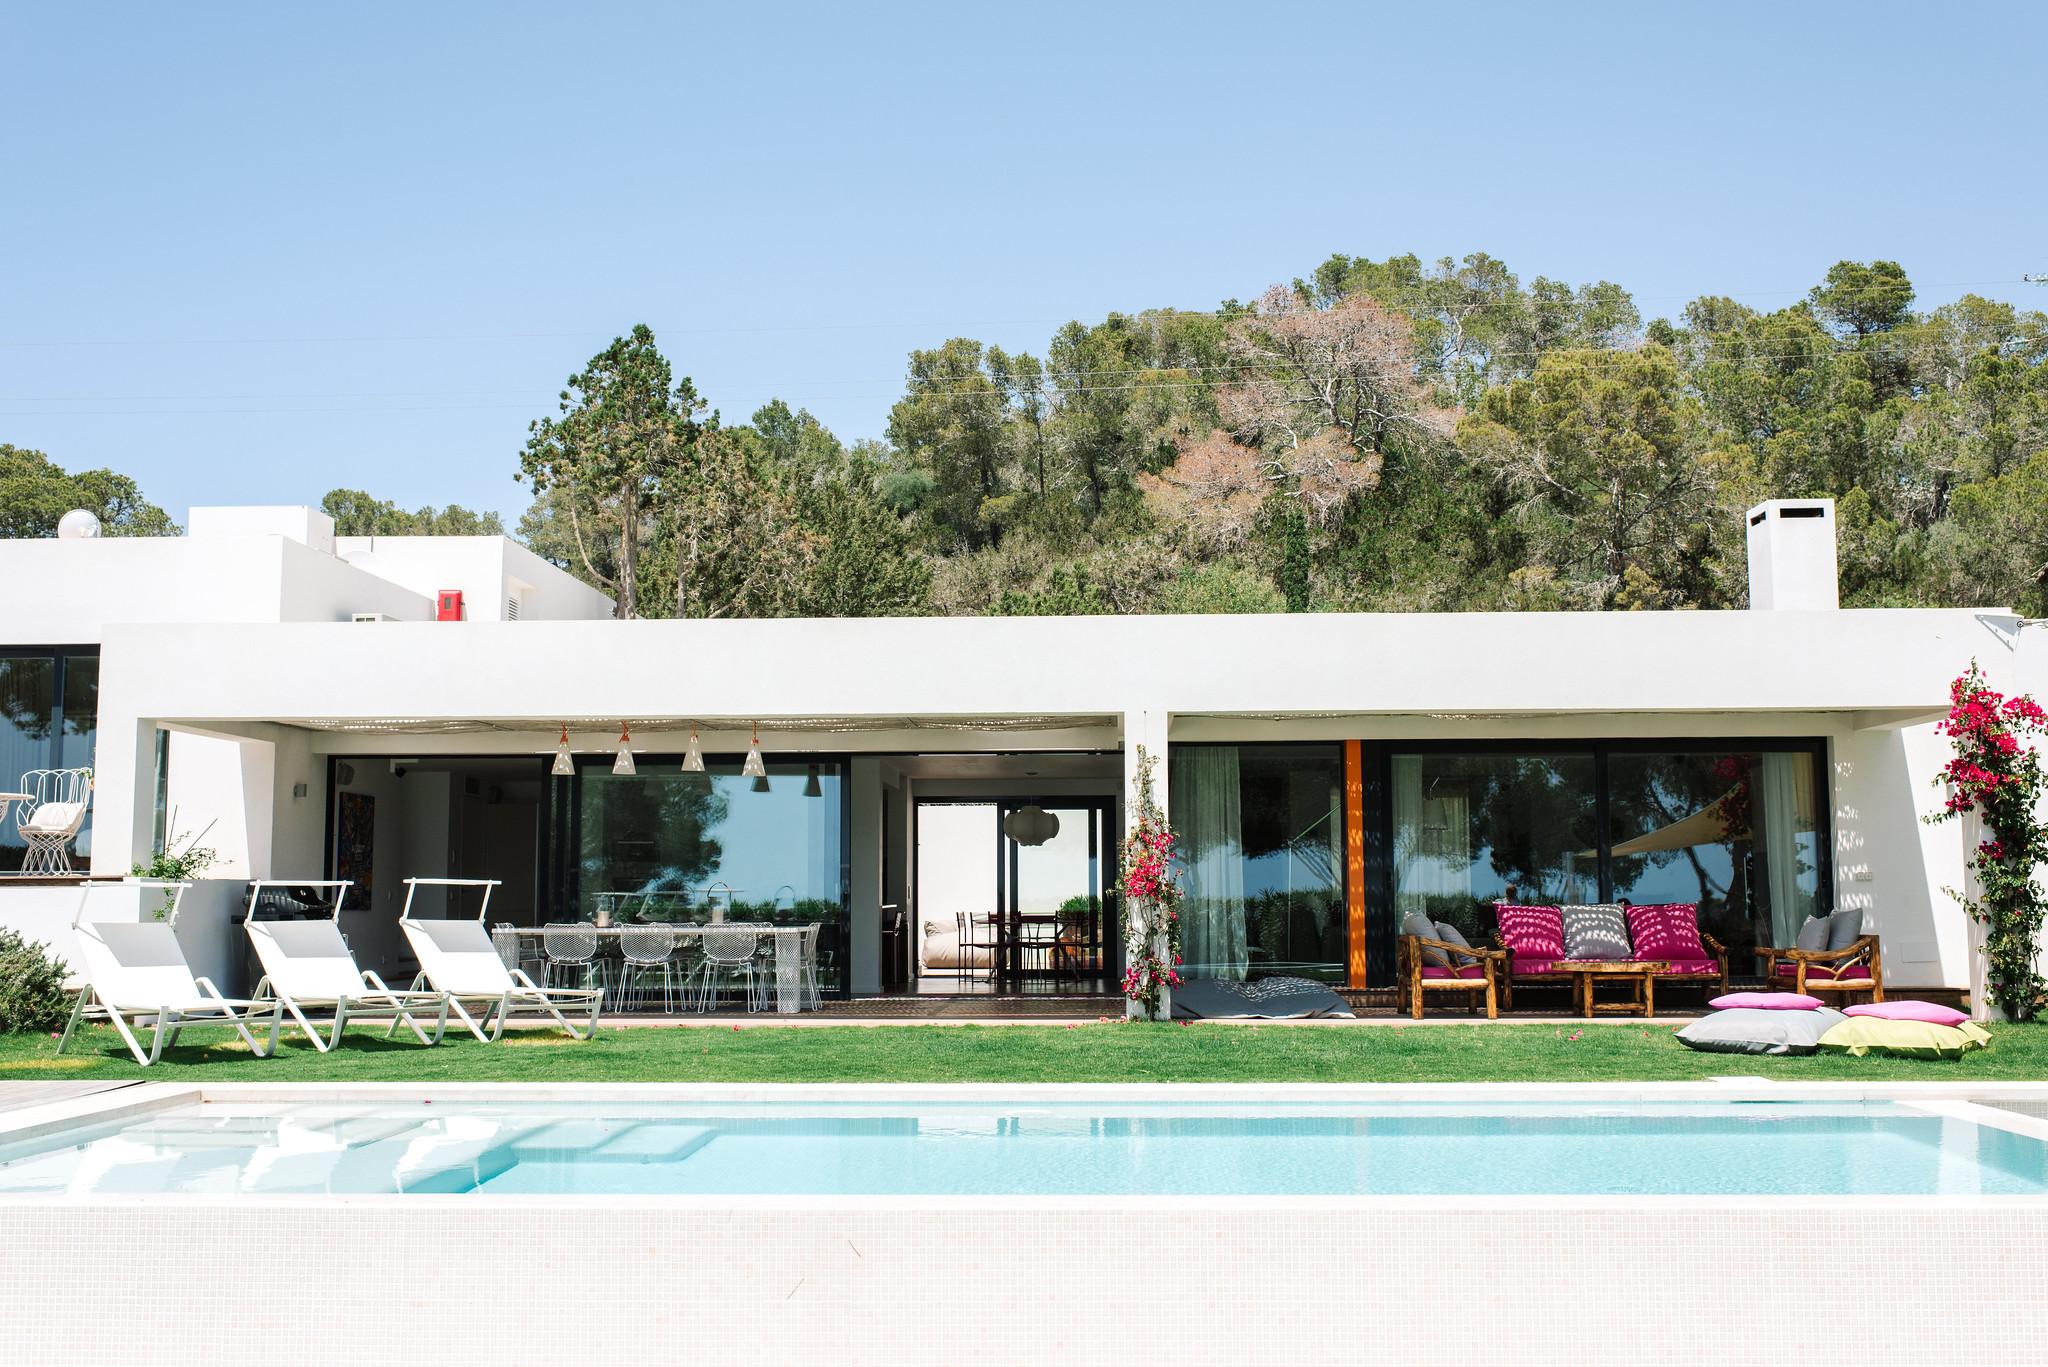 https://www.white-ibiza.com/wp-content/uploads/2020/06/white-ibiza-villas-can-jondal-exterior-view-to-house-1.jpg